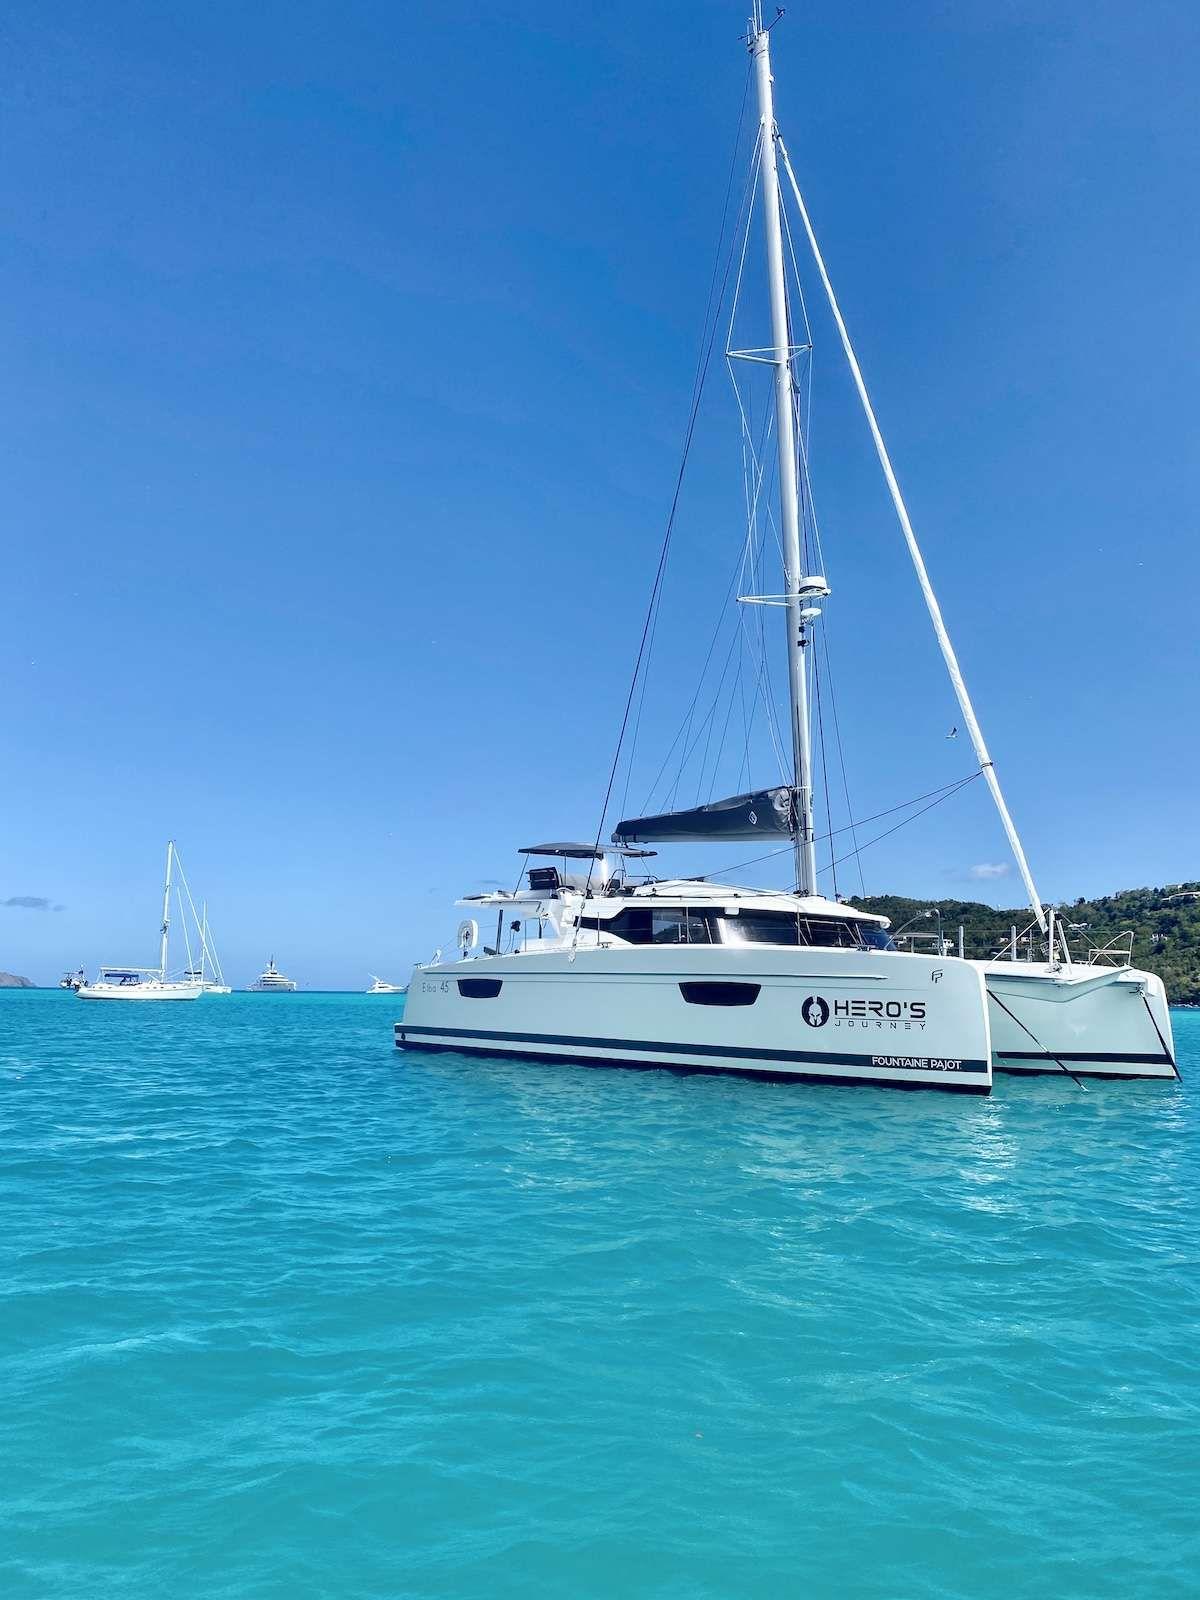 HEROS JOURNEY - Fountaine Pajot 45 - 2 Cabins - Virgin Islands - St Thomas - Tortola - Virgin Gorda - St John